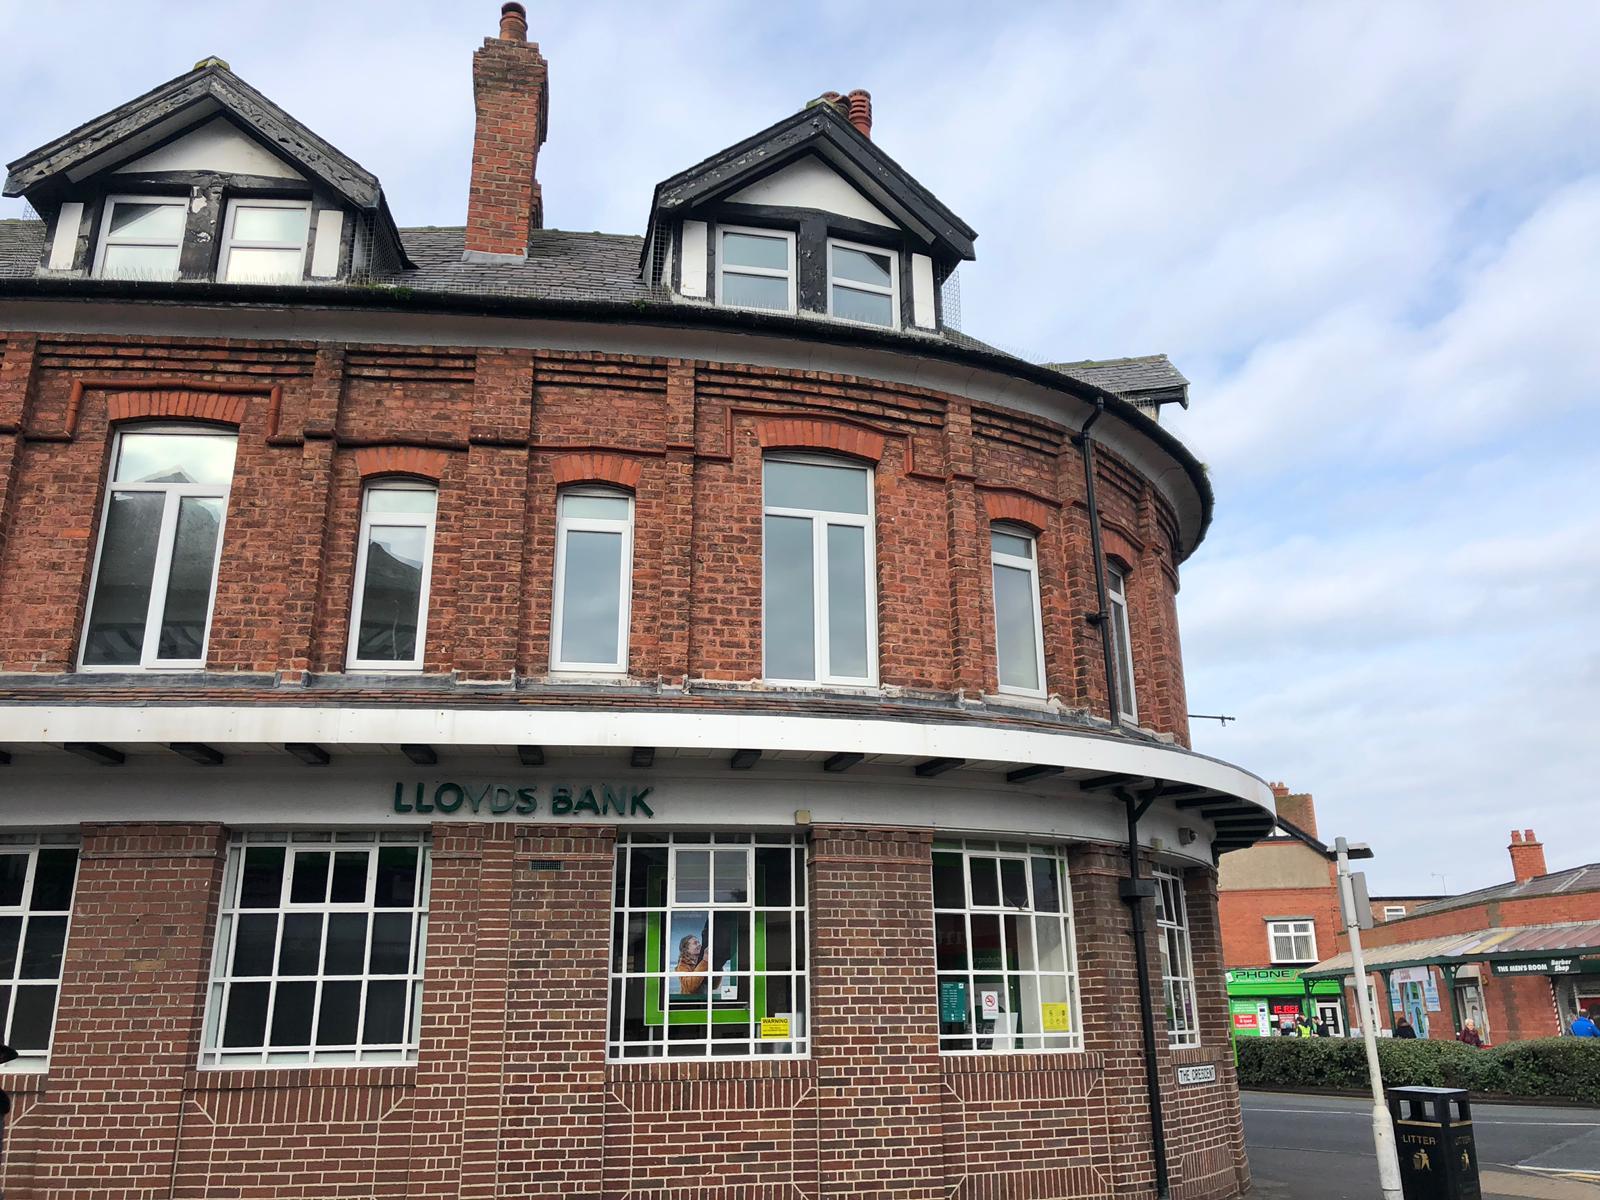 Lloyds Bank in West Kirby